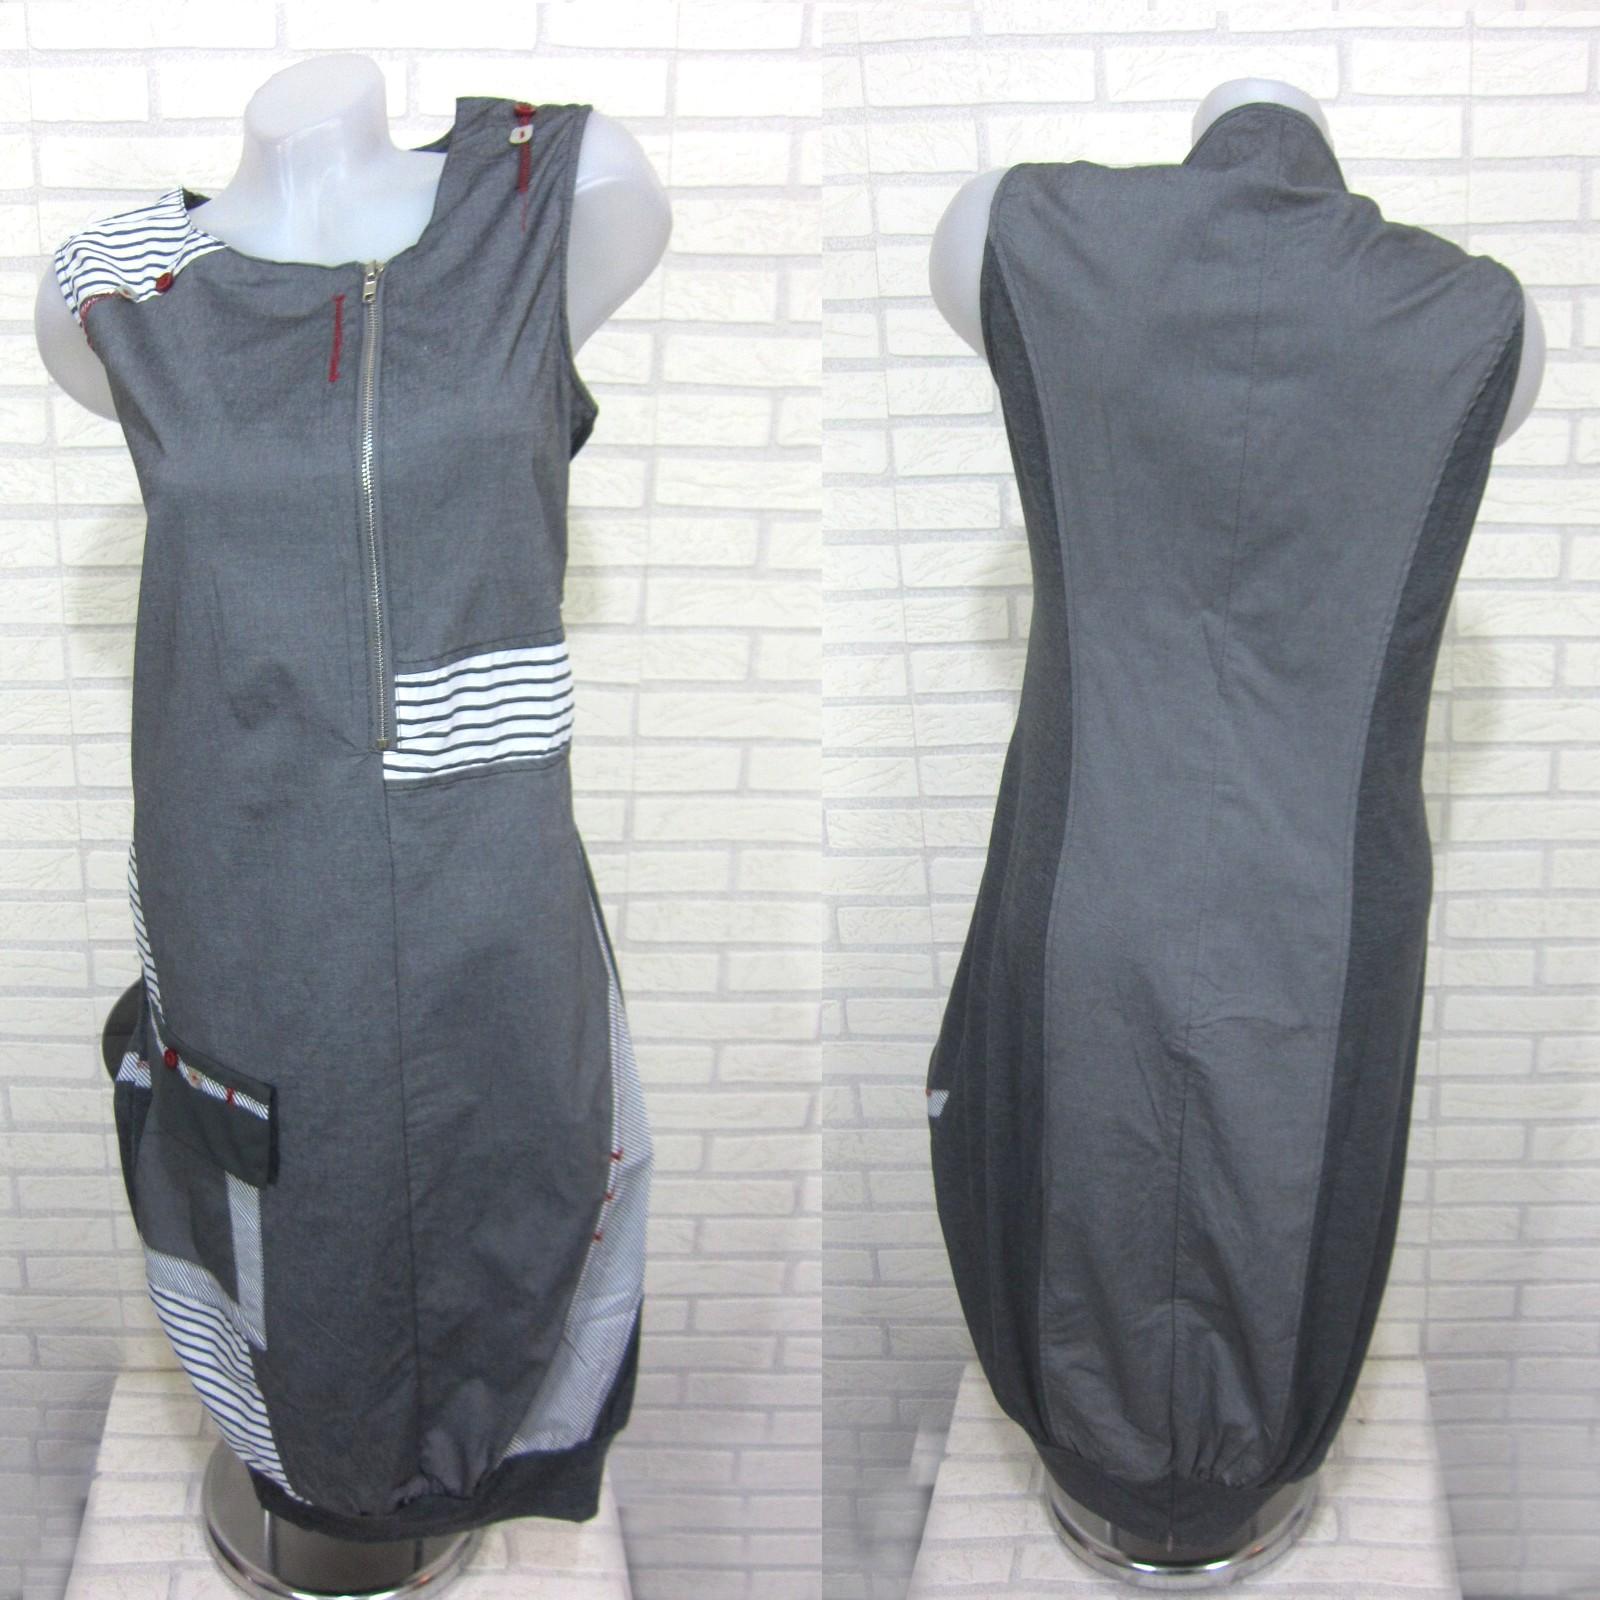 neu damen lagenlook tunika kleid longshirt h ngerchen grau. Black Bedroom Furniture Sets. Home Design Ideas